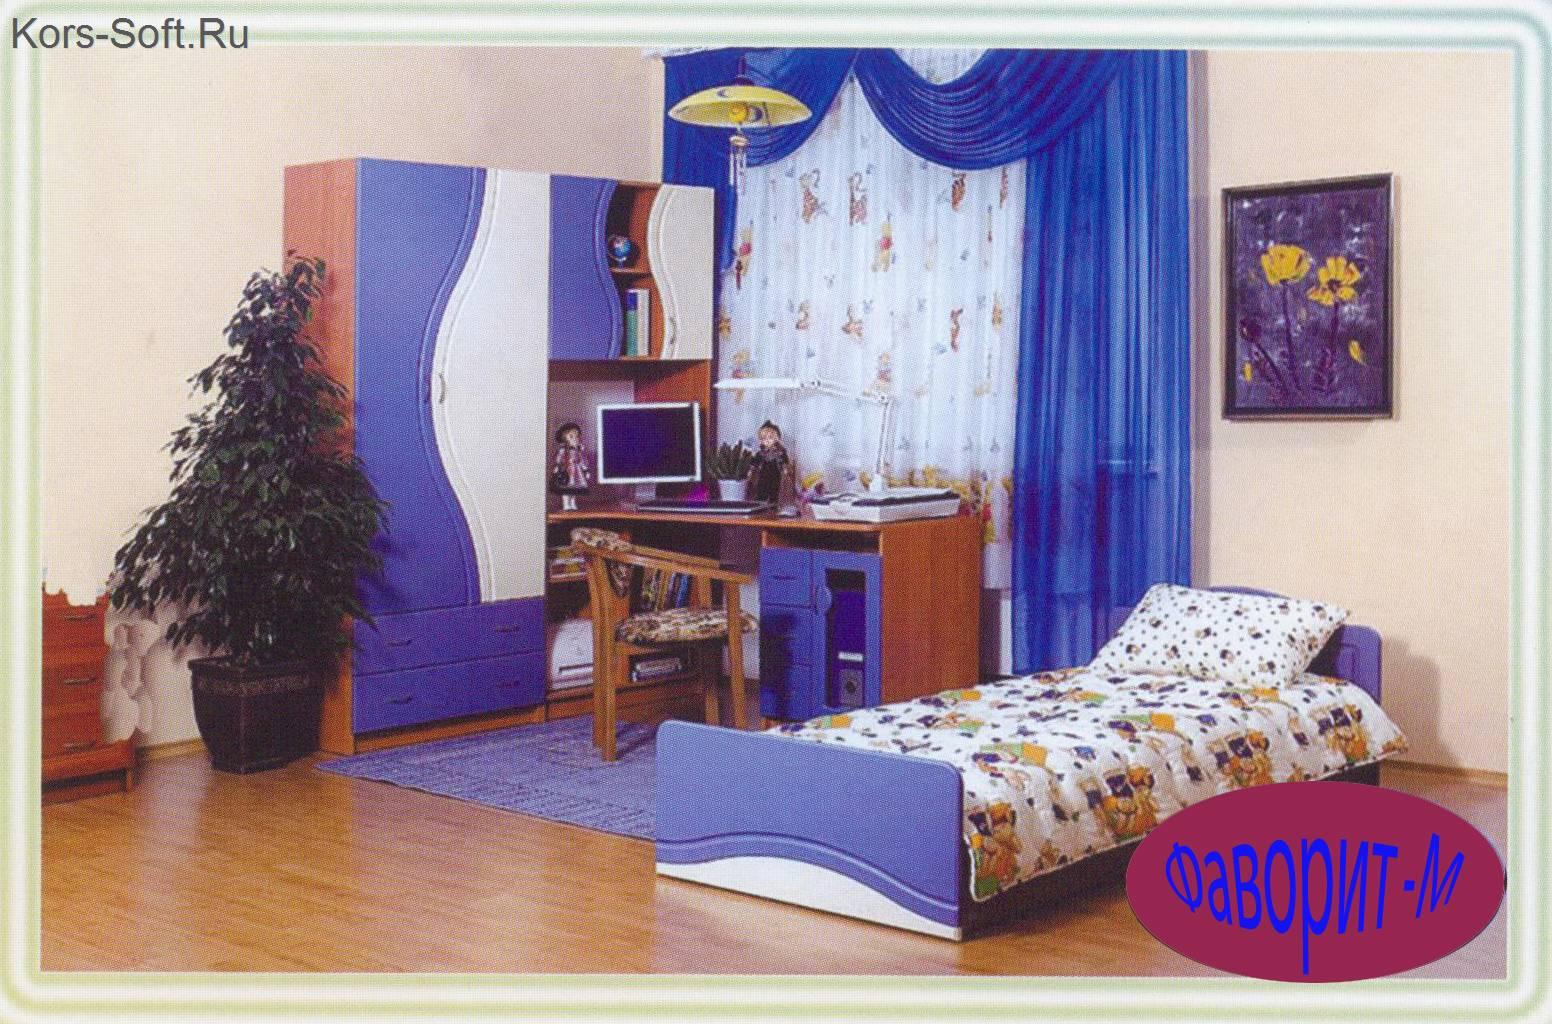 дизайн комната фото спальны детски зал кухня